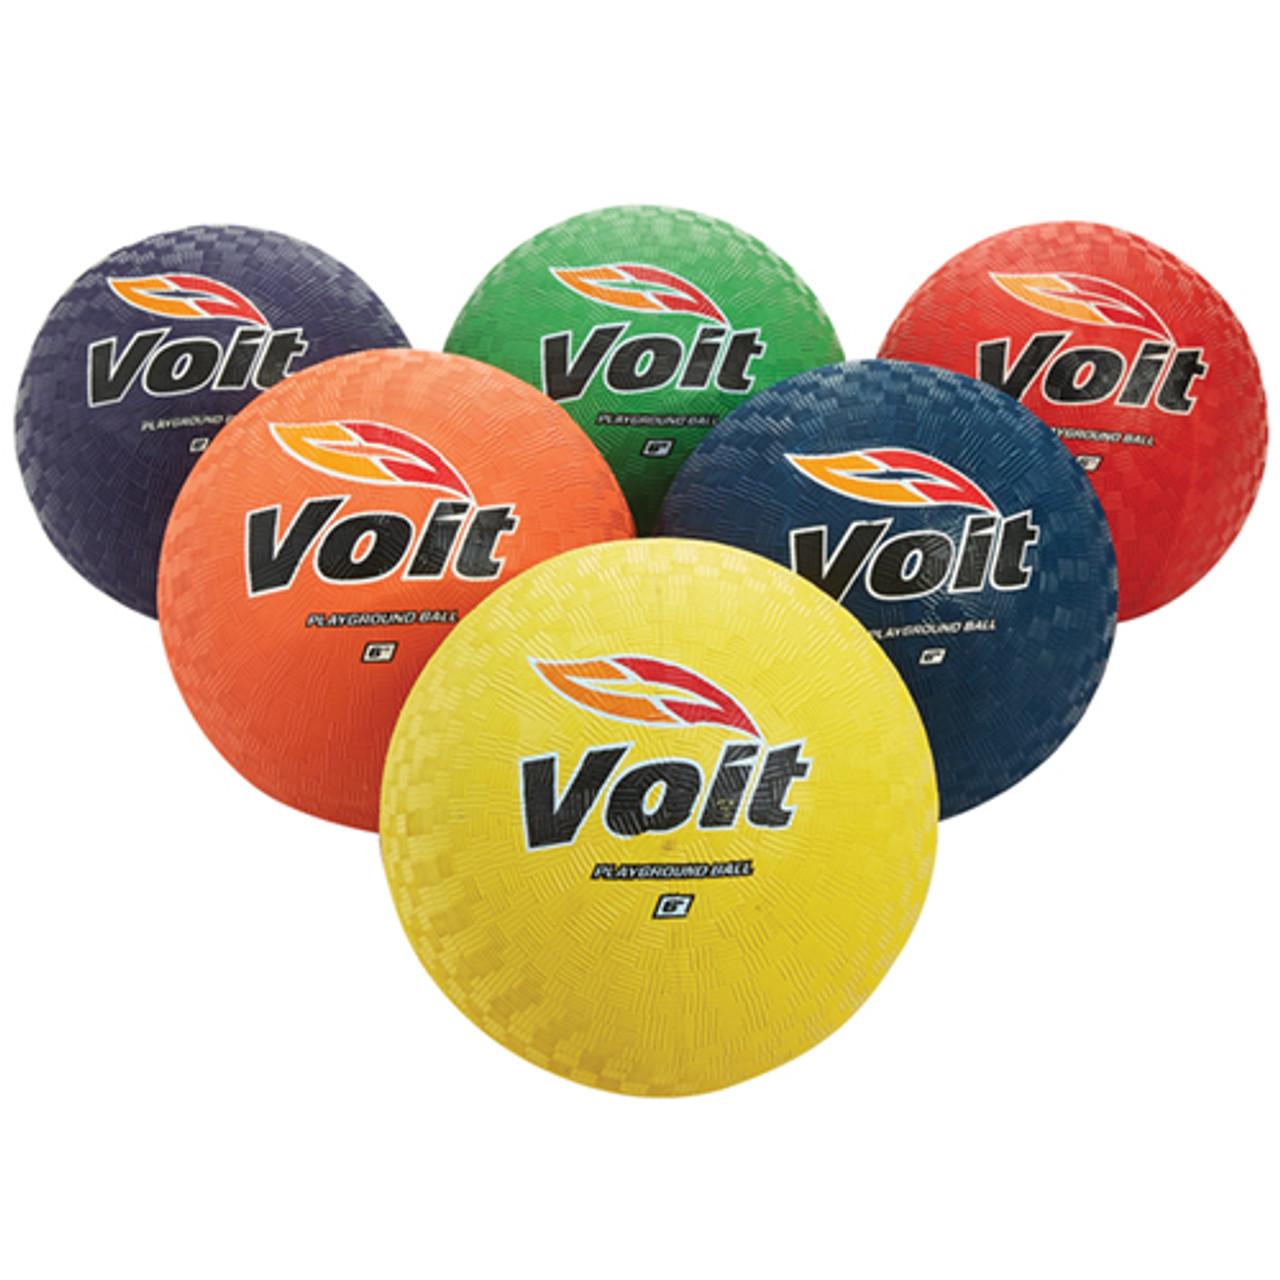 Voit Playground Balls